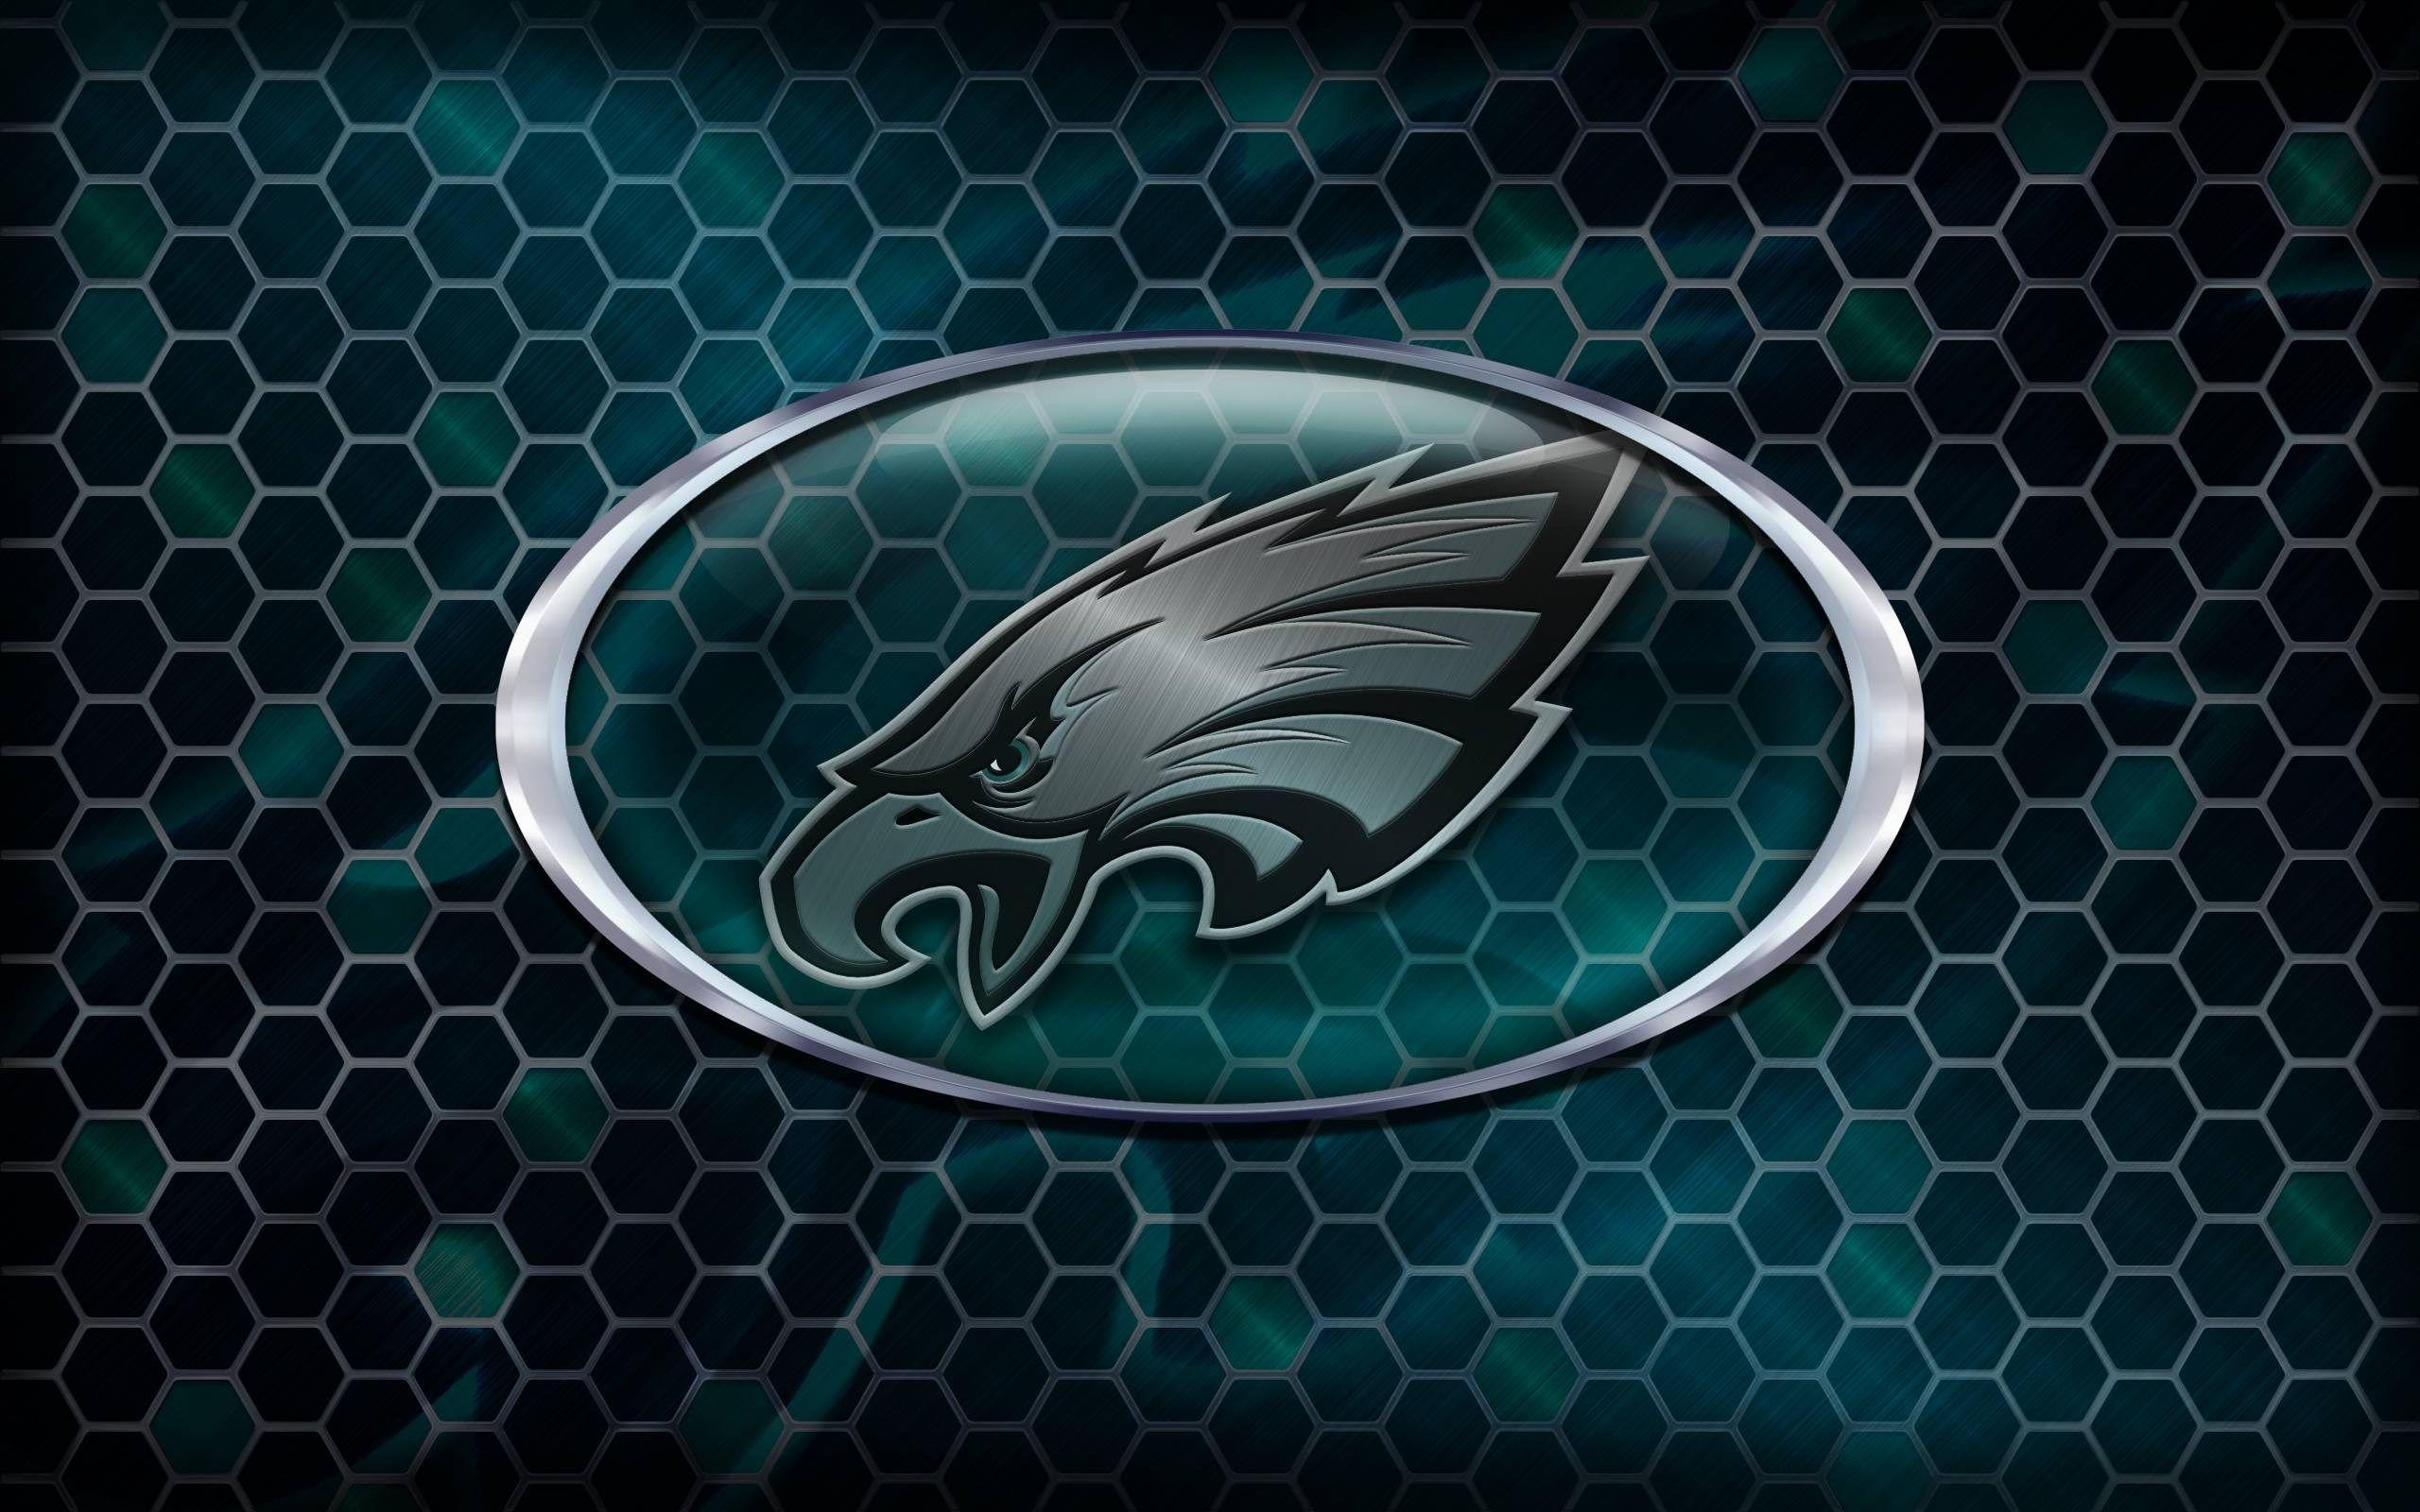 philadelphia eagles logo wallpapers hd background download free ...